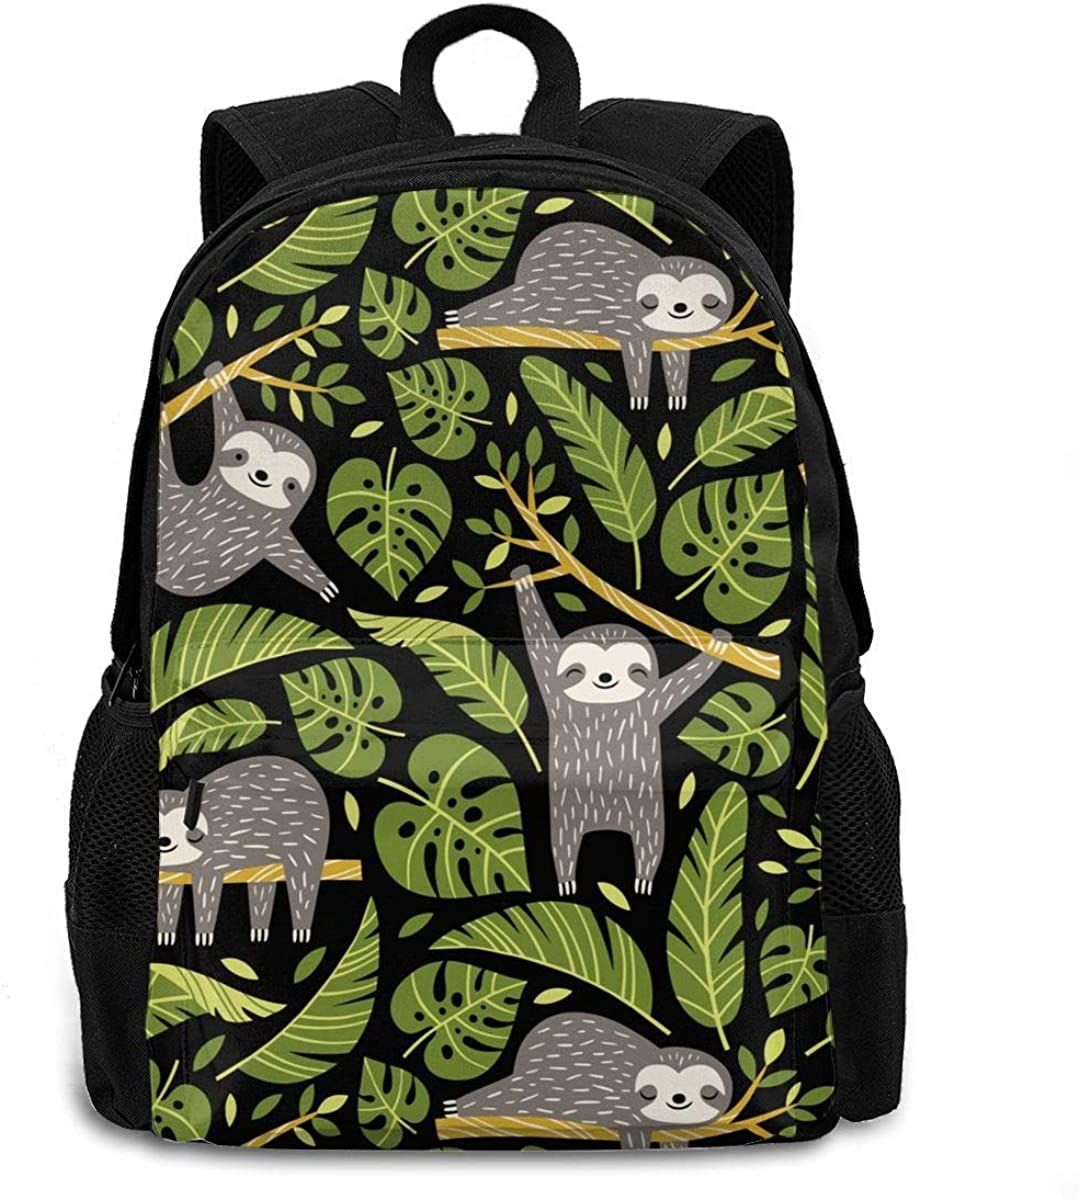 American Flag Cat Laptop Backpack College Students Bookbags School Bags Bookbag Travel Daypack for Men Women